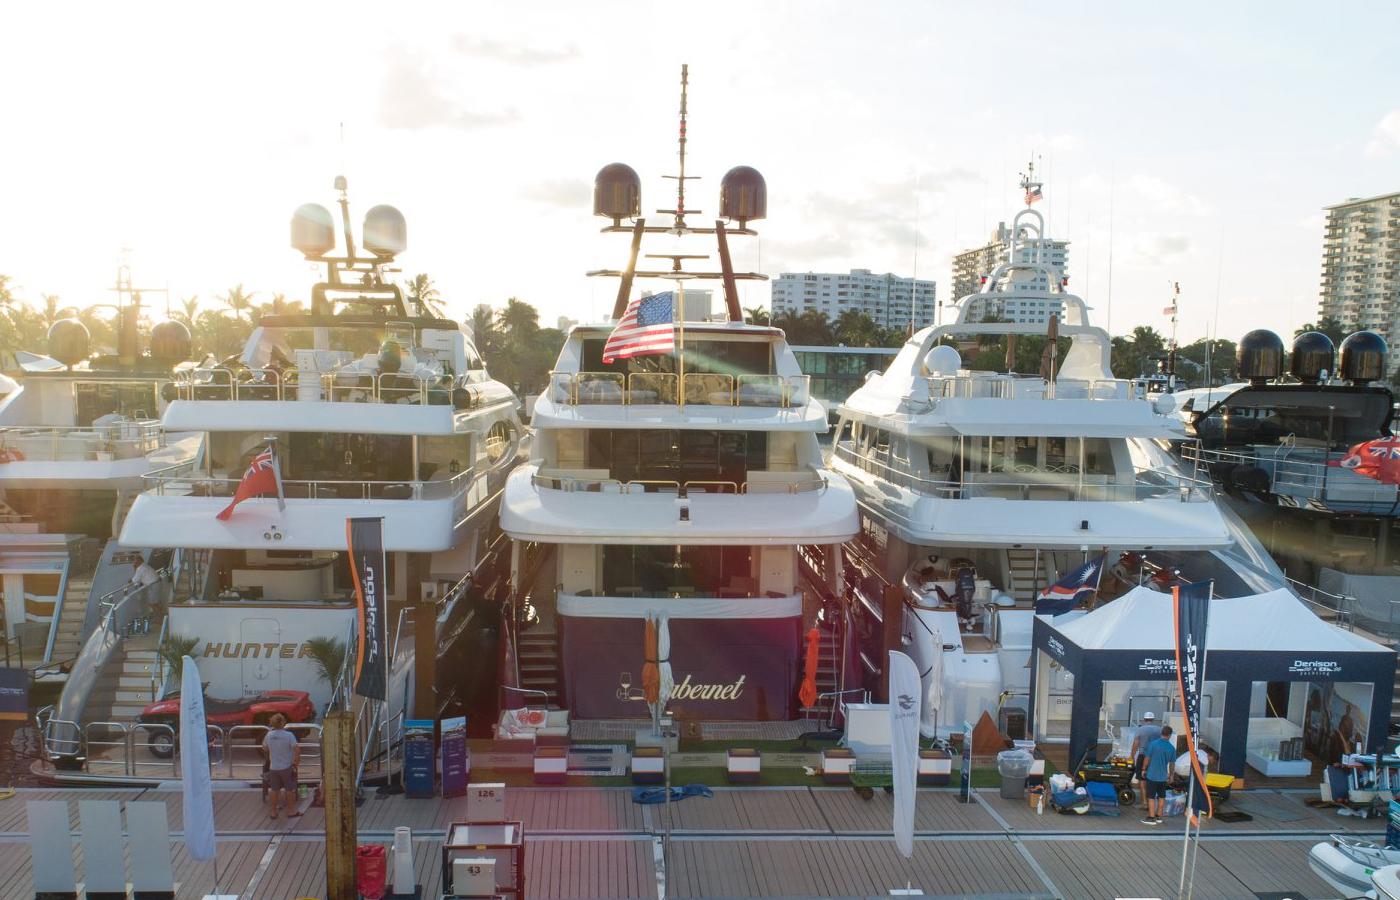 Top 5 Biggest Denison Superyachts At FLIBS 2019